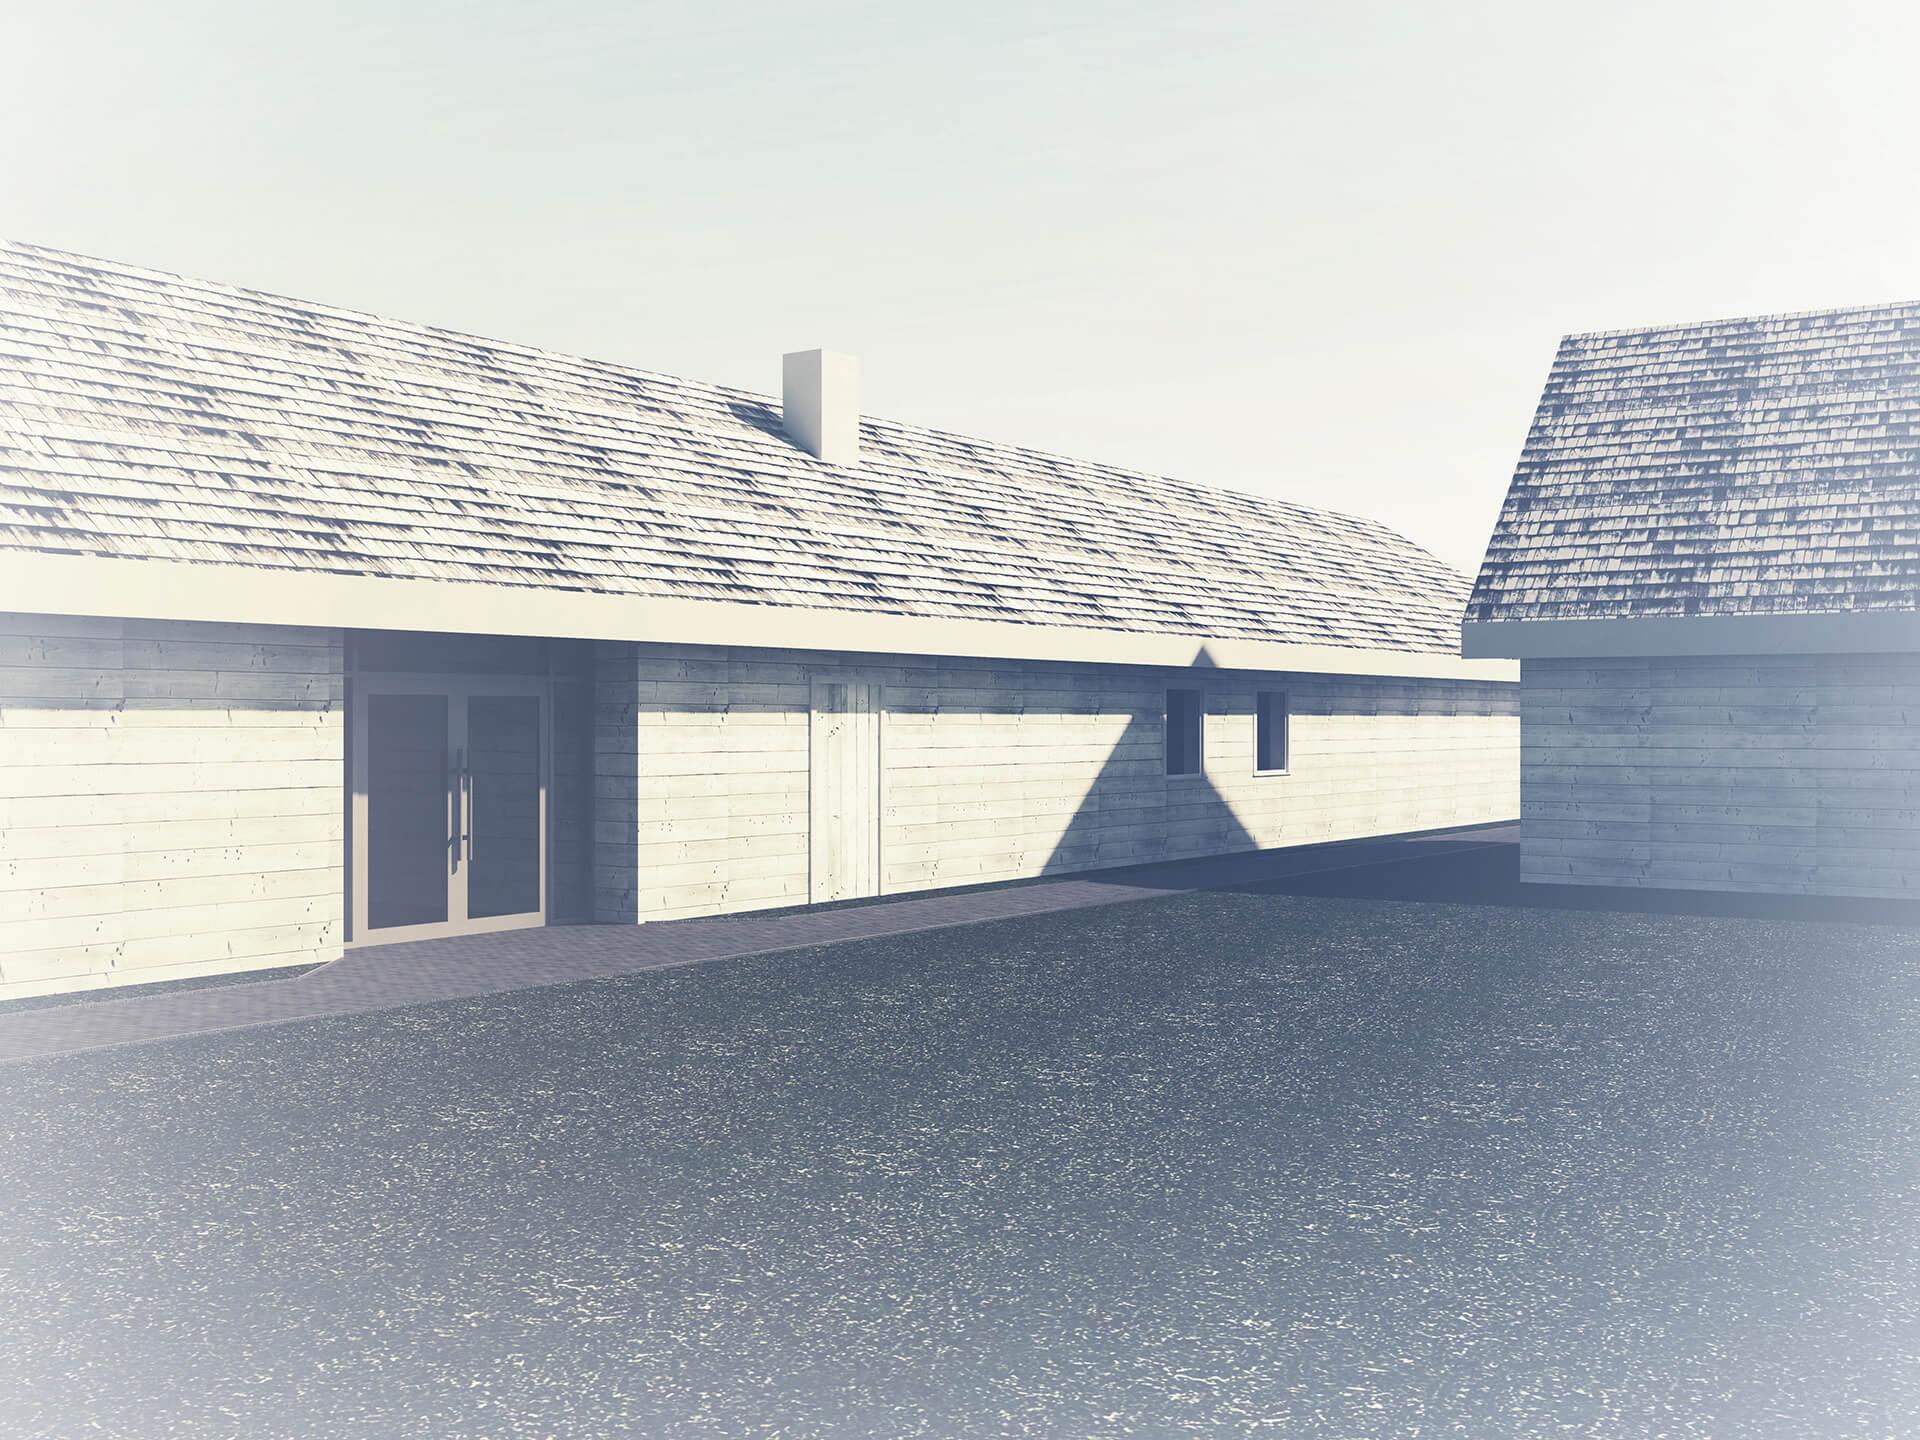 https://laagaarchitects.lv/wp-content/uploads/2019/11/03-04-7-Ruuj.jpg